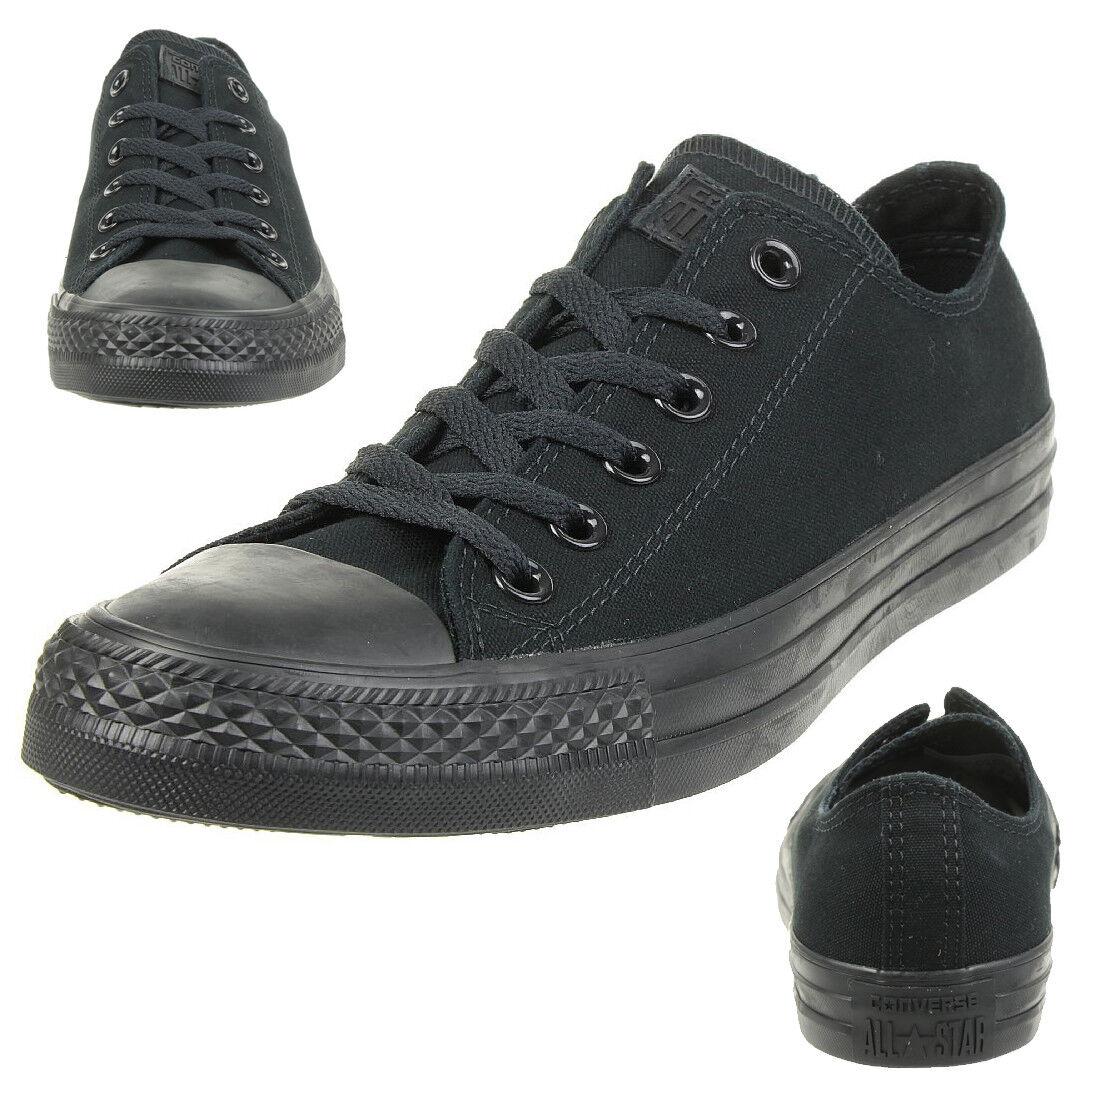 Converse All Star OX Chuck Schuhe Sneaker canvas Black Monochrome M5039C